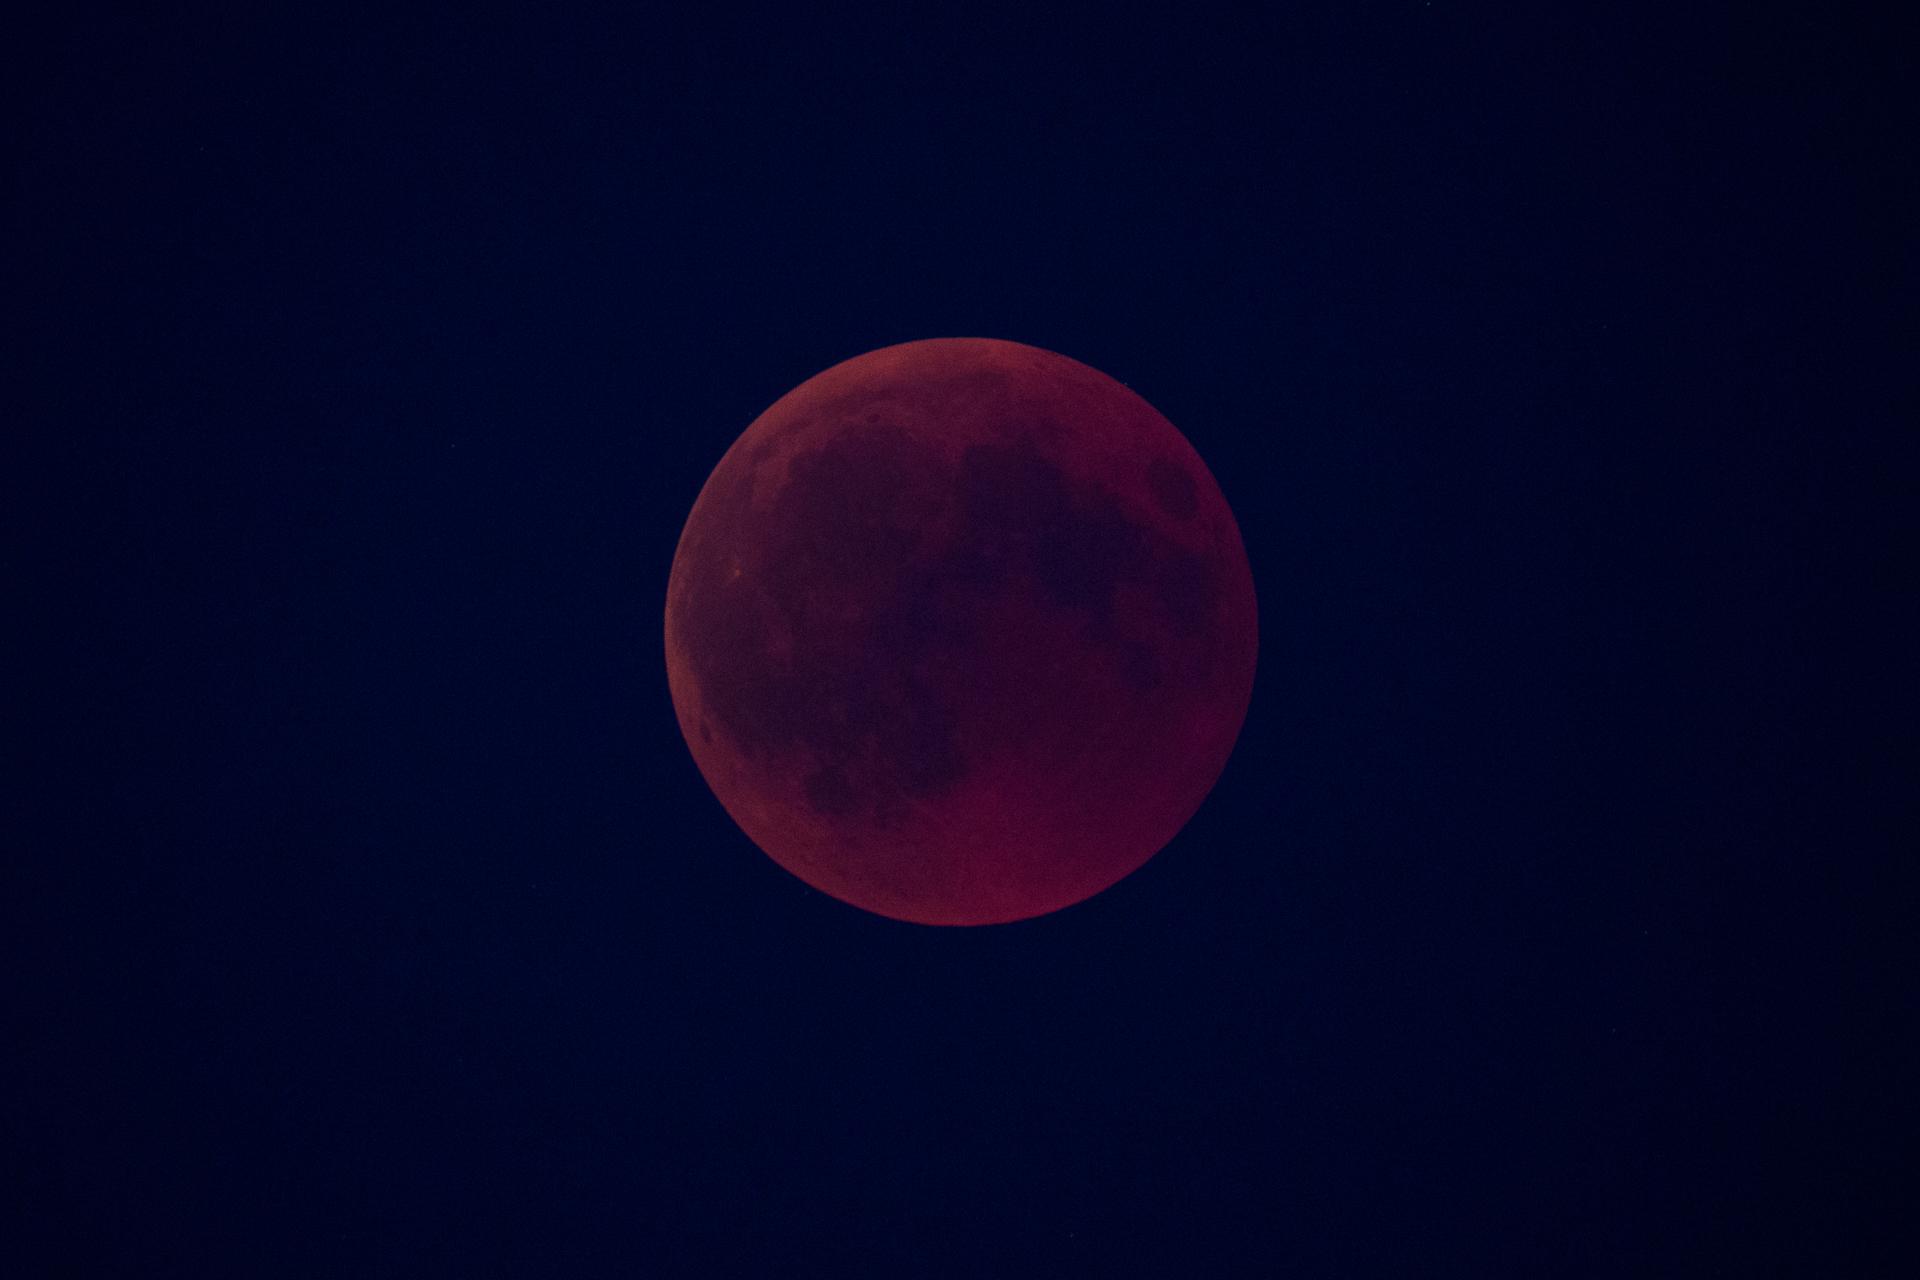 20180727_LunarEclipse-1